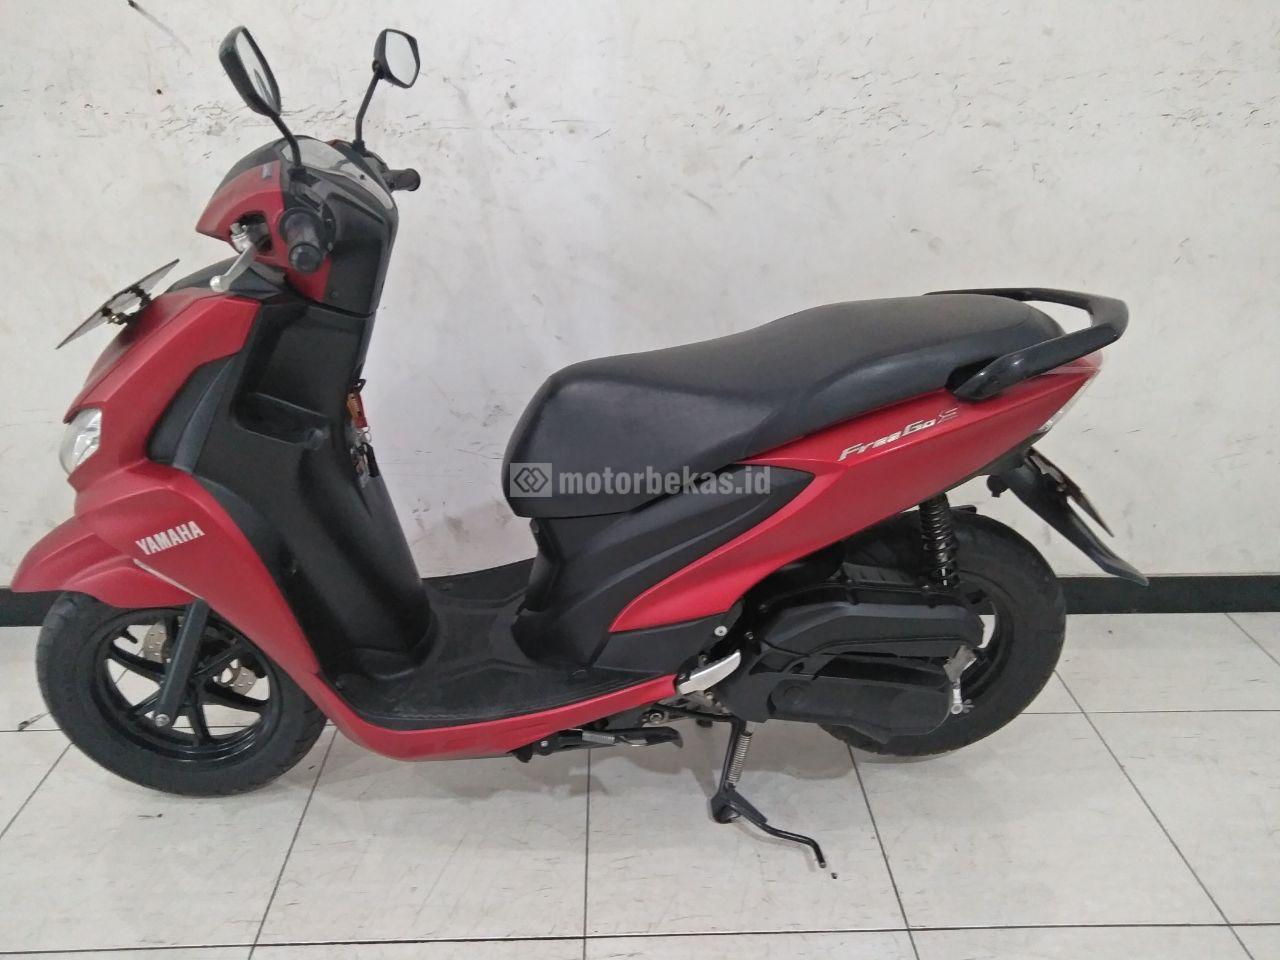 YAMAHA FREE GO S  4305 motorbekas.id